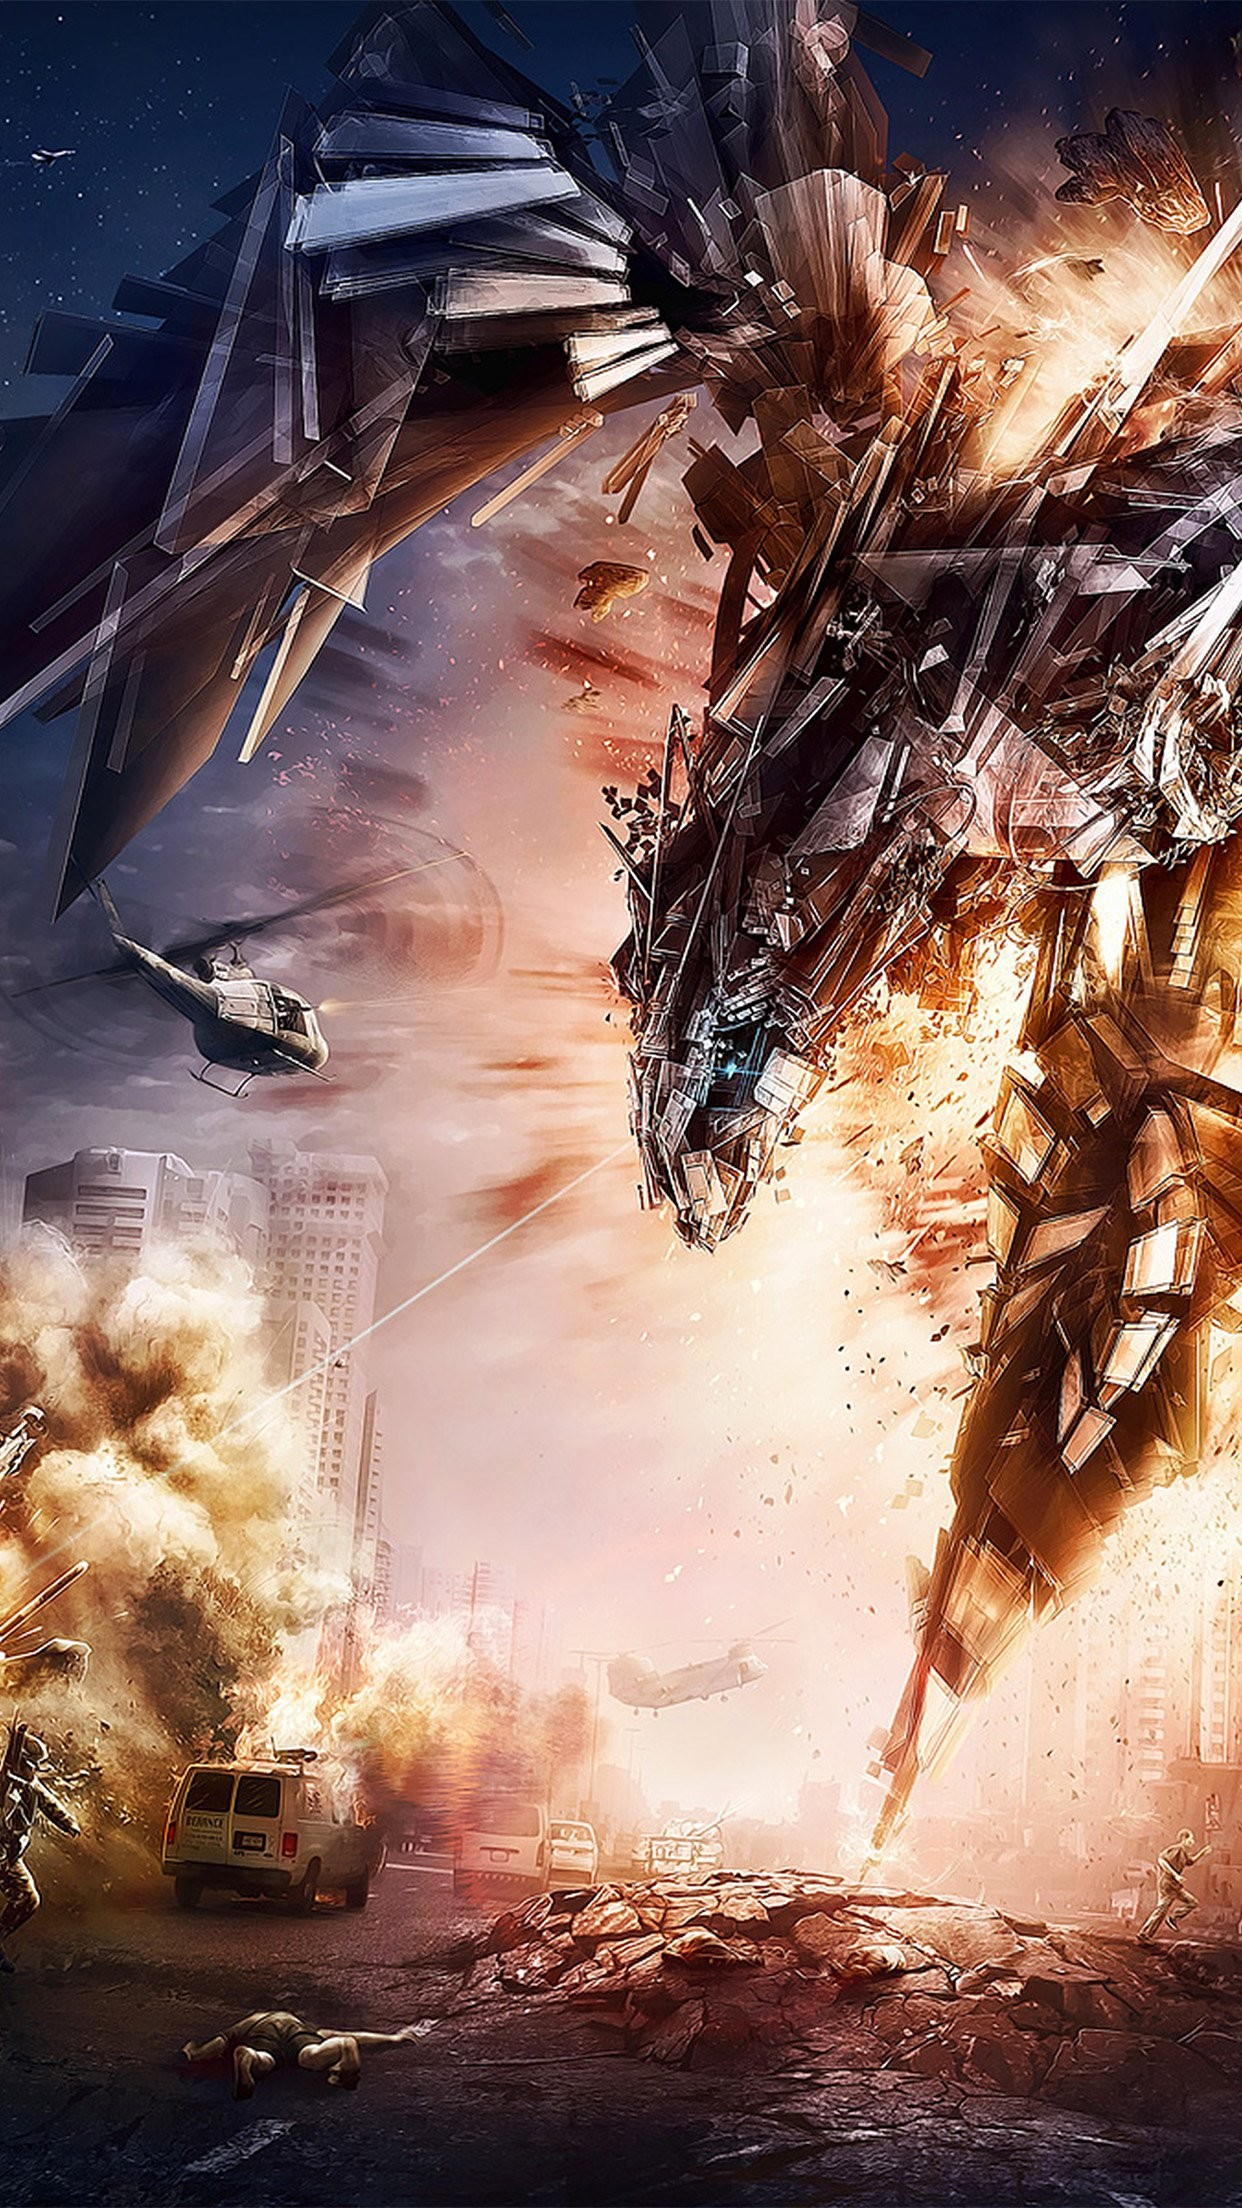 Transformers Artwork Film Illustration IPhone 7 Plus Wallpaper